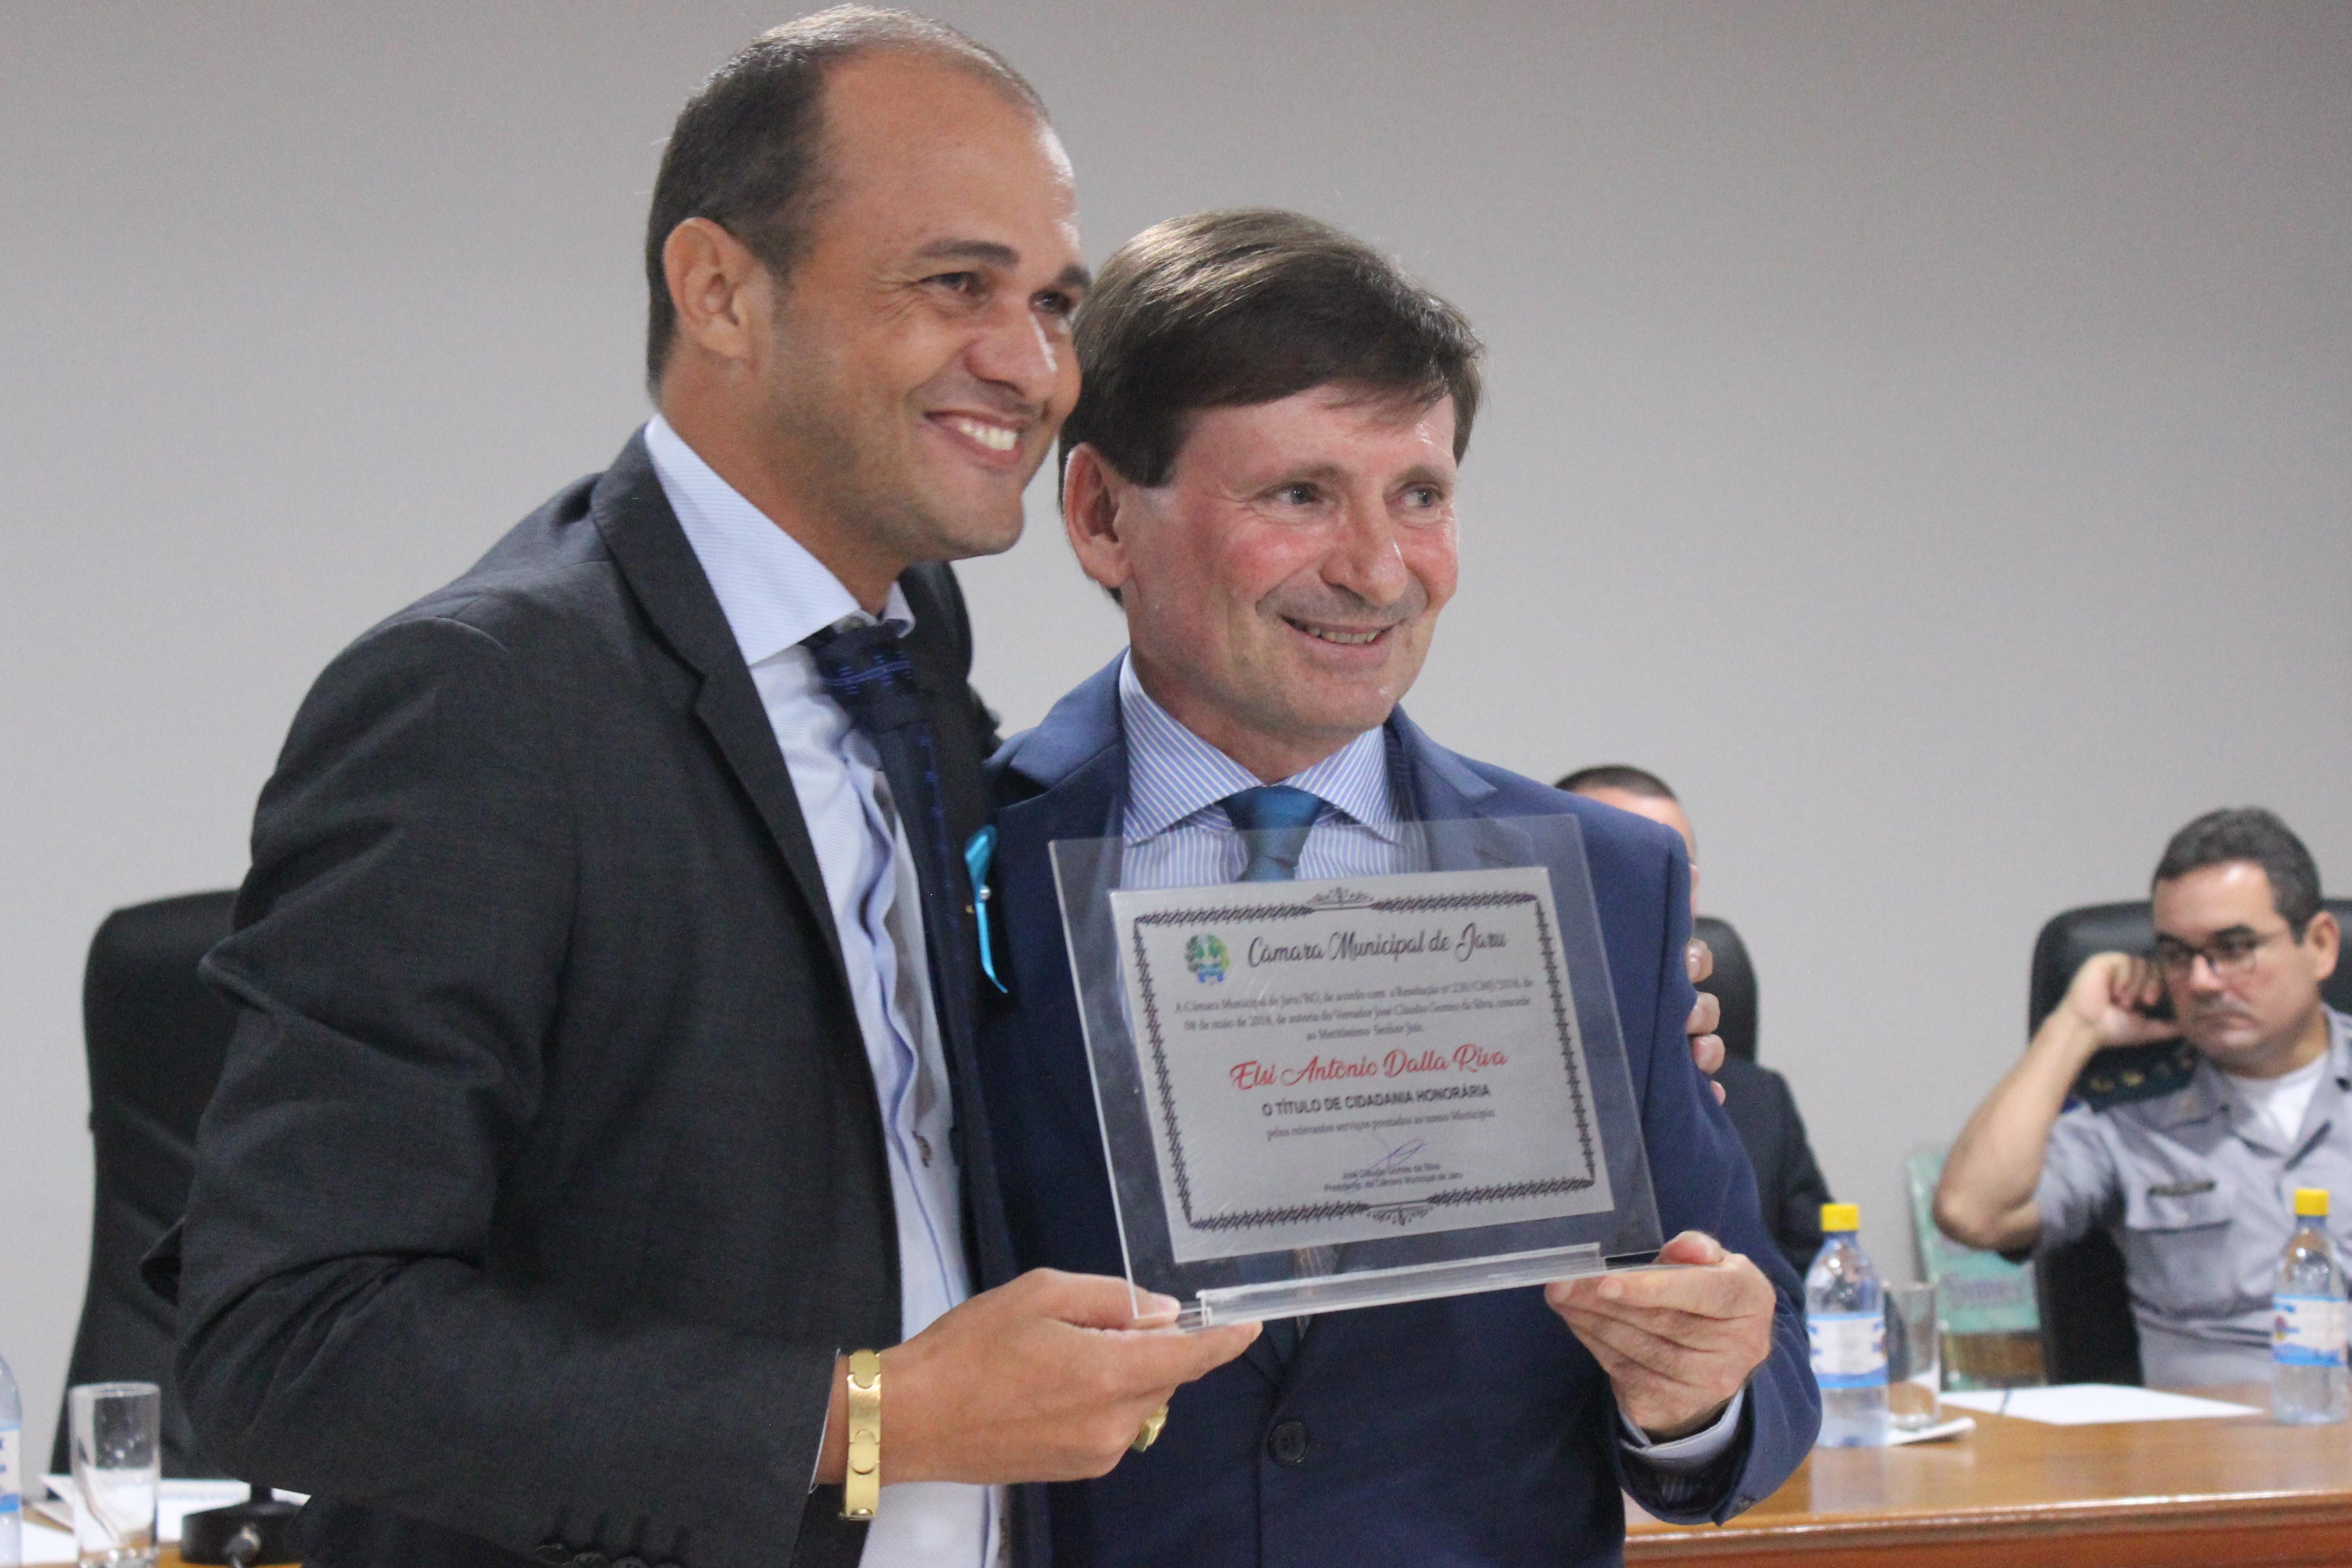 Elsi Dalla Riva recebe título de Cidadão Honorário